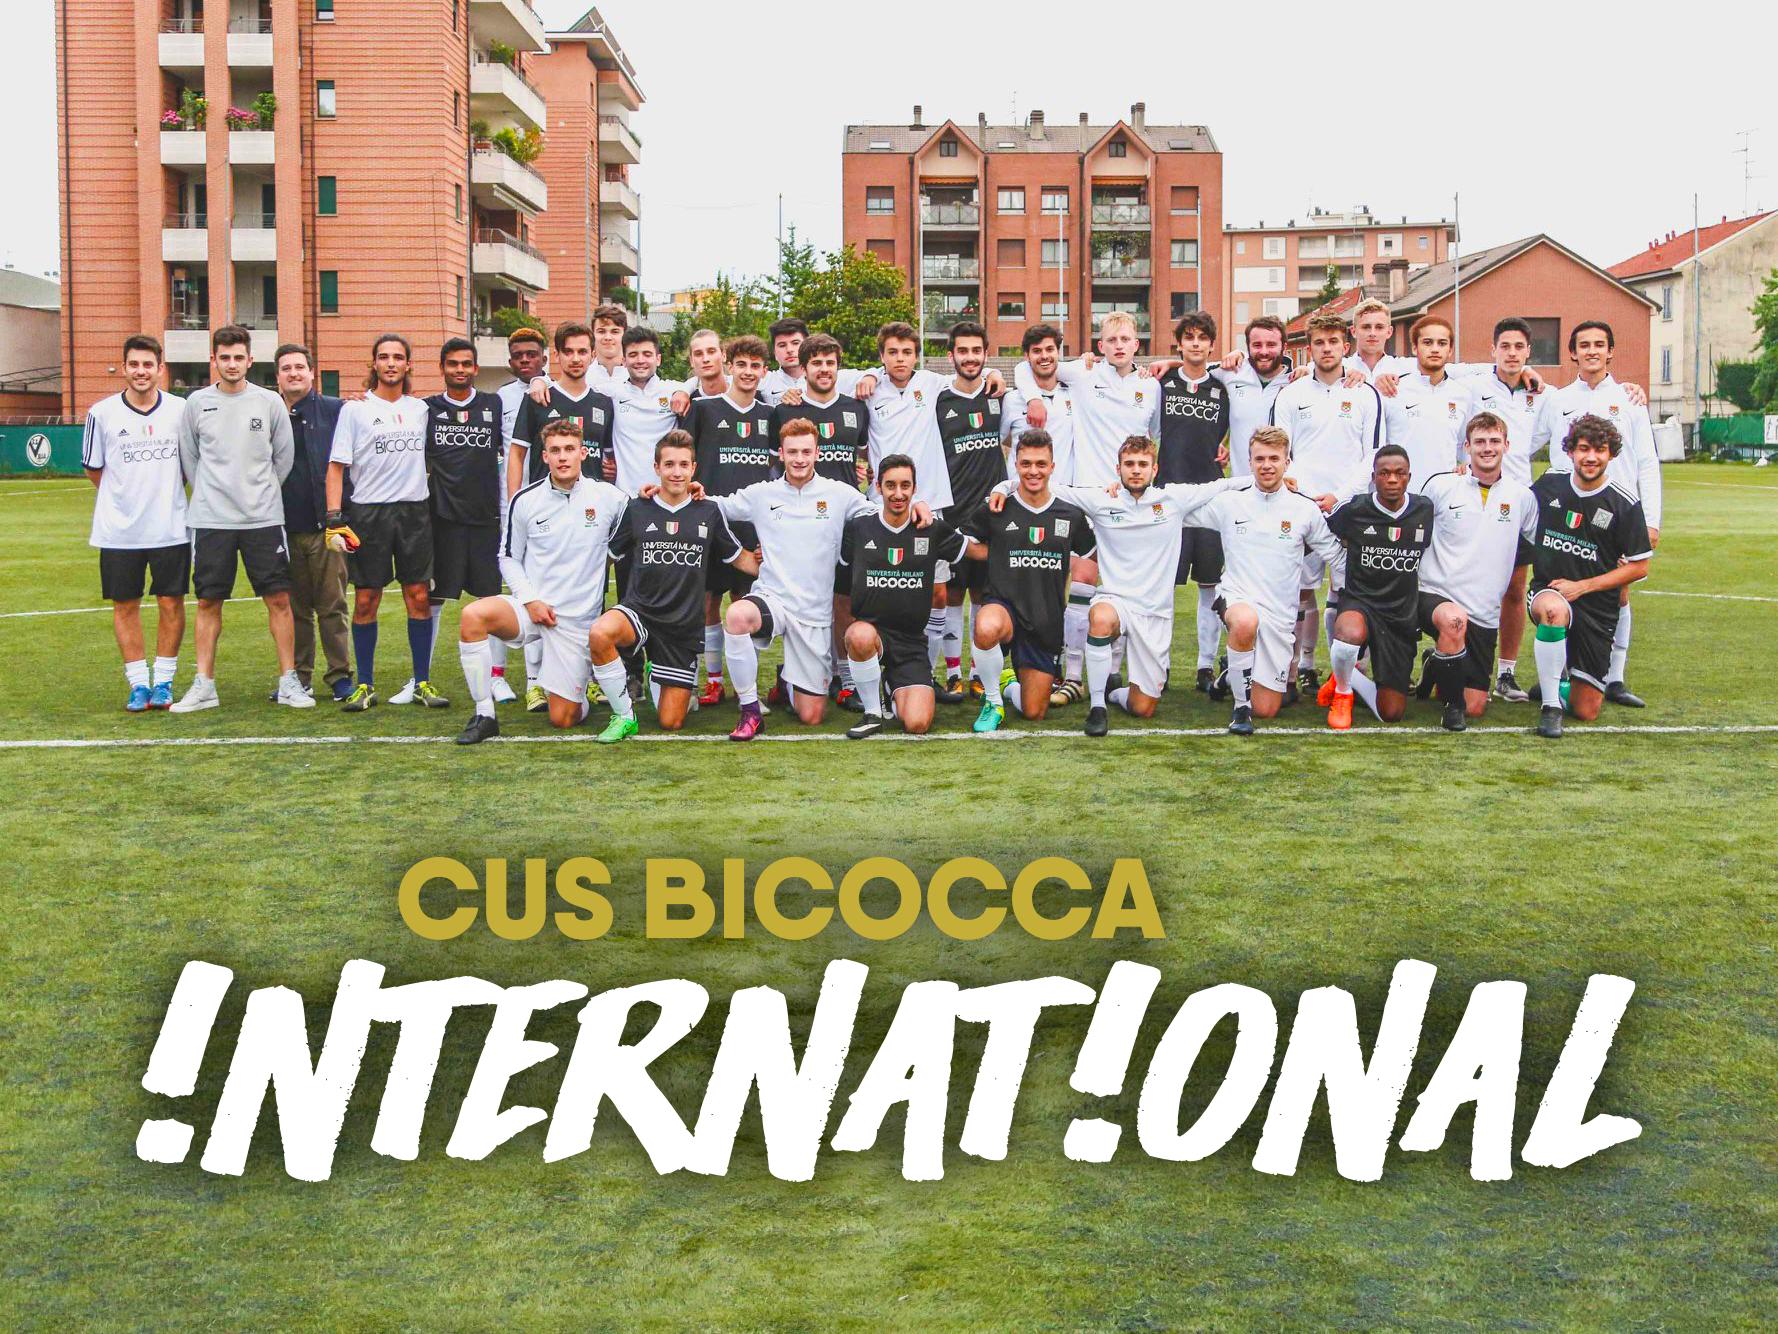 CUS Bicocca International